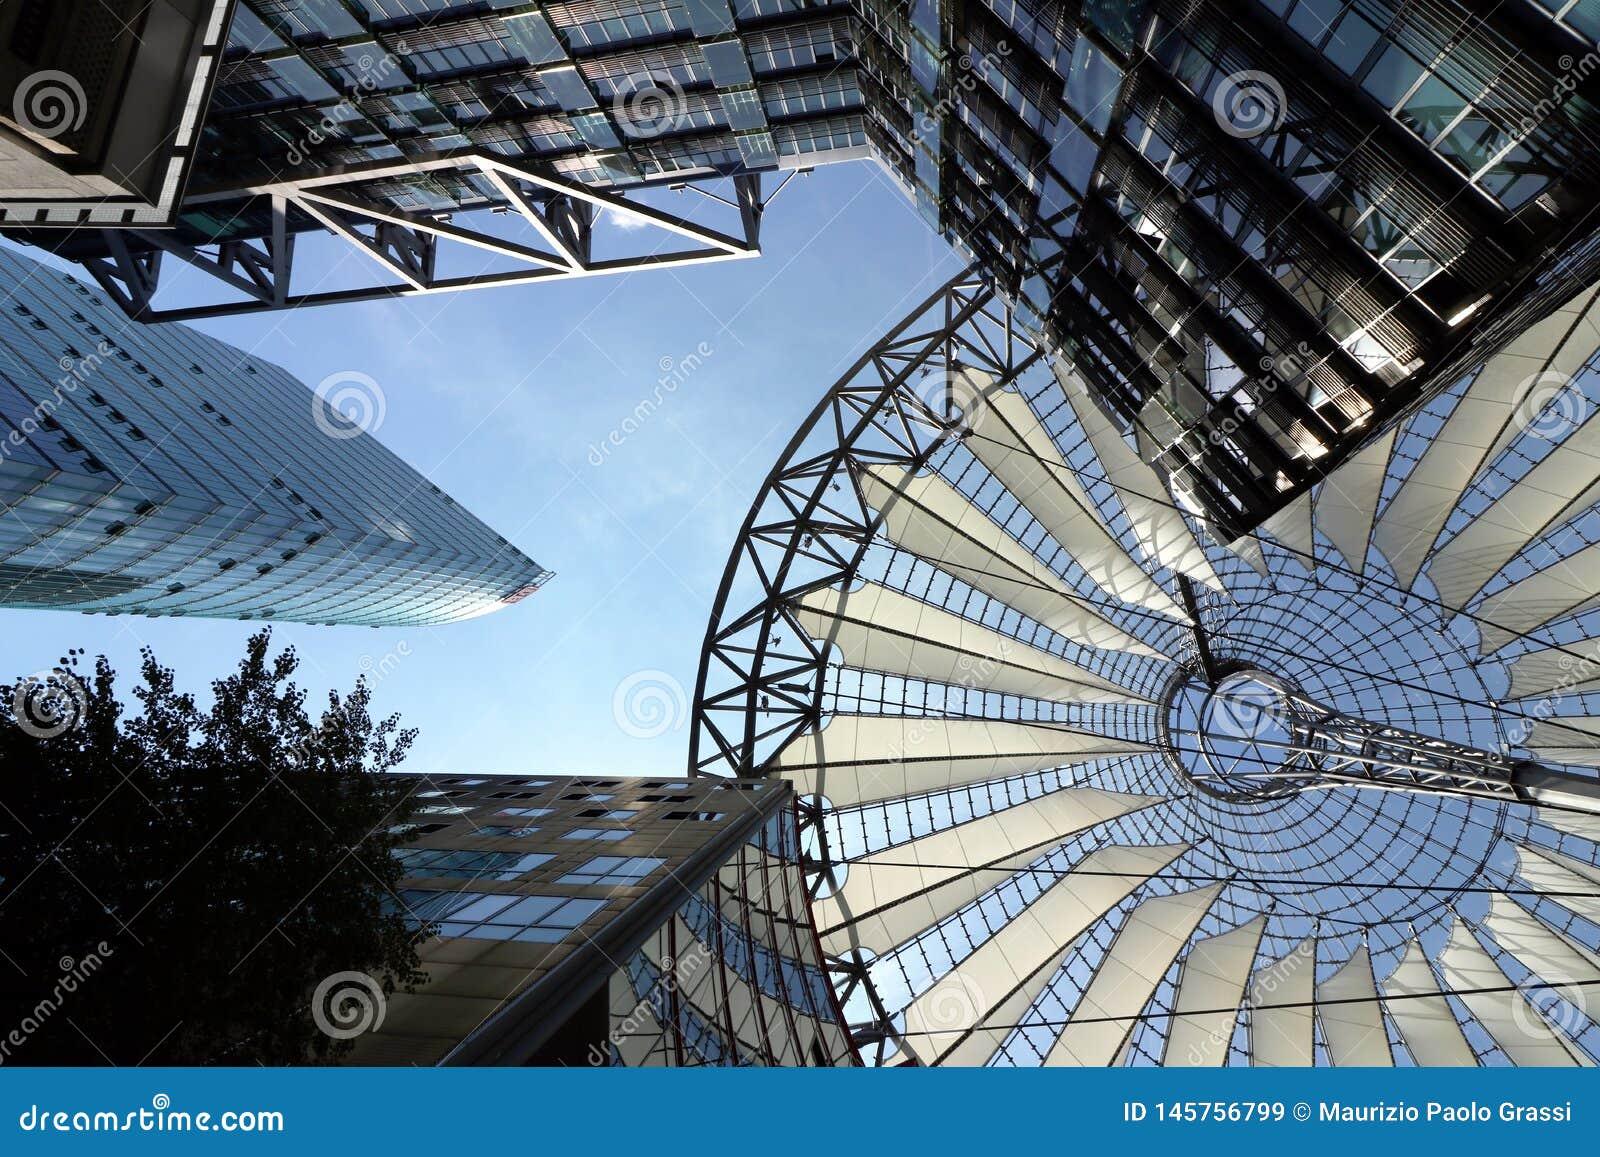 Beriberi 06/14/2018 Современная архитектура центра Sony на Потсдамской площади